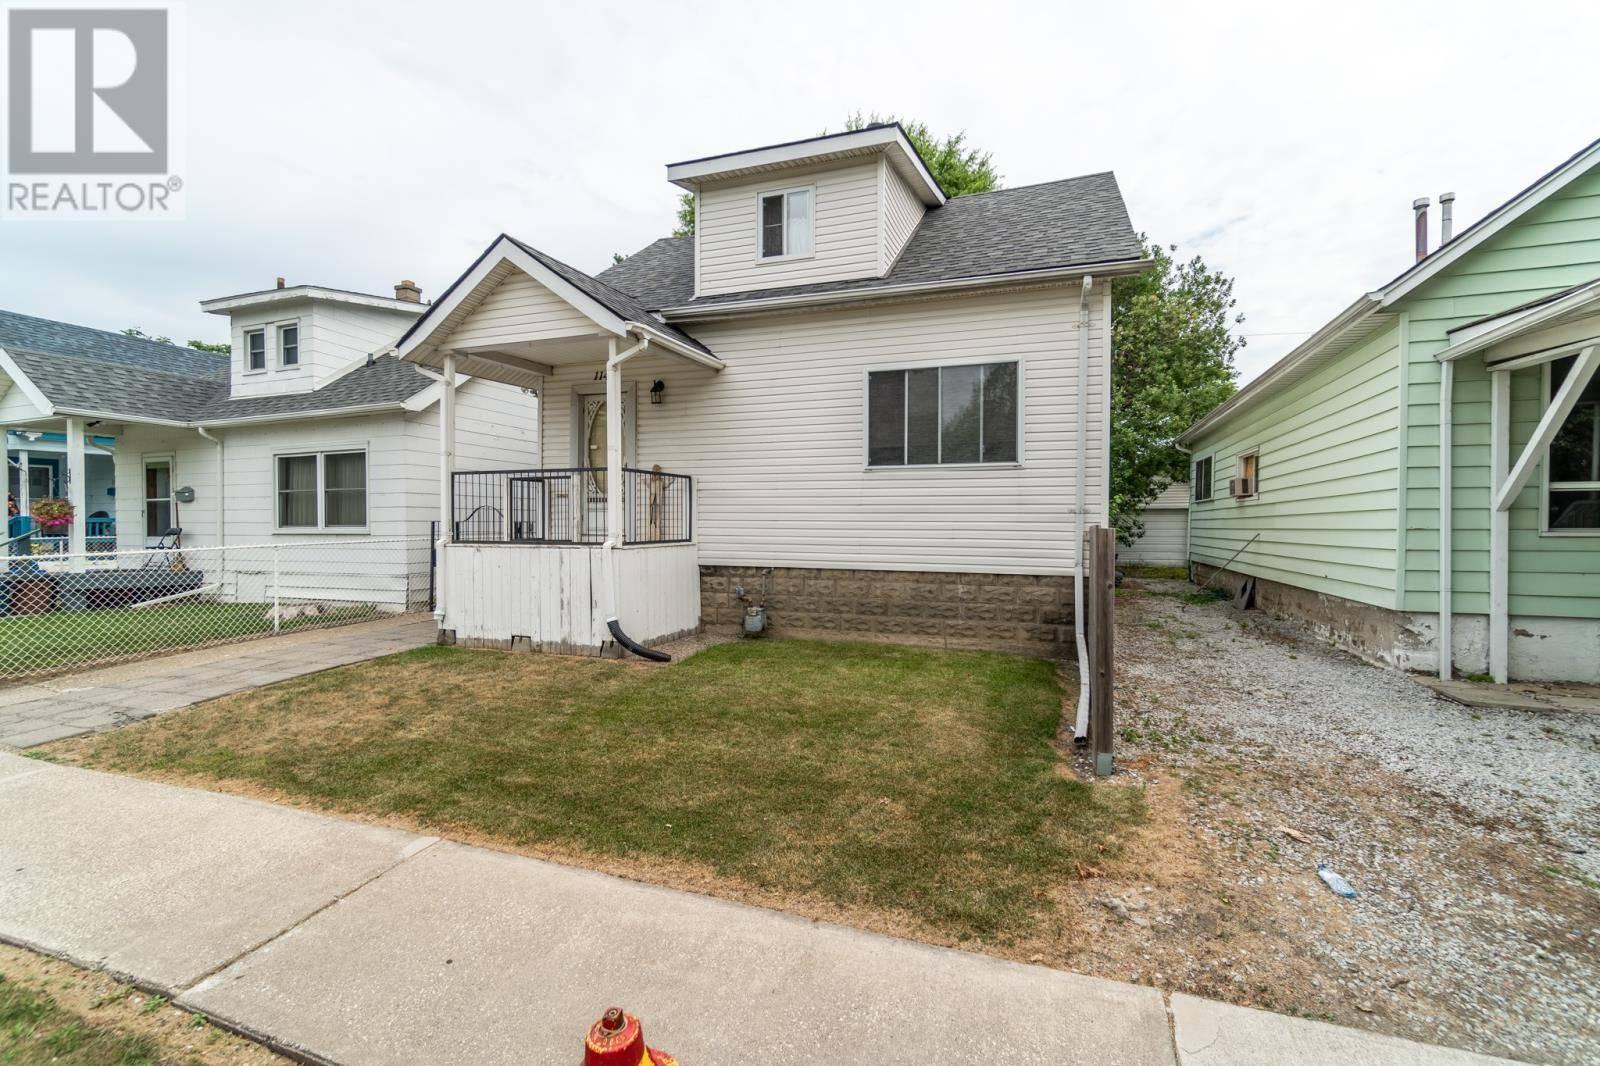 House for sale at 1146 St Luke Road  Windsor Ontario - MLS: 19023124